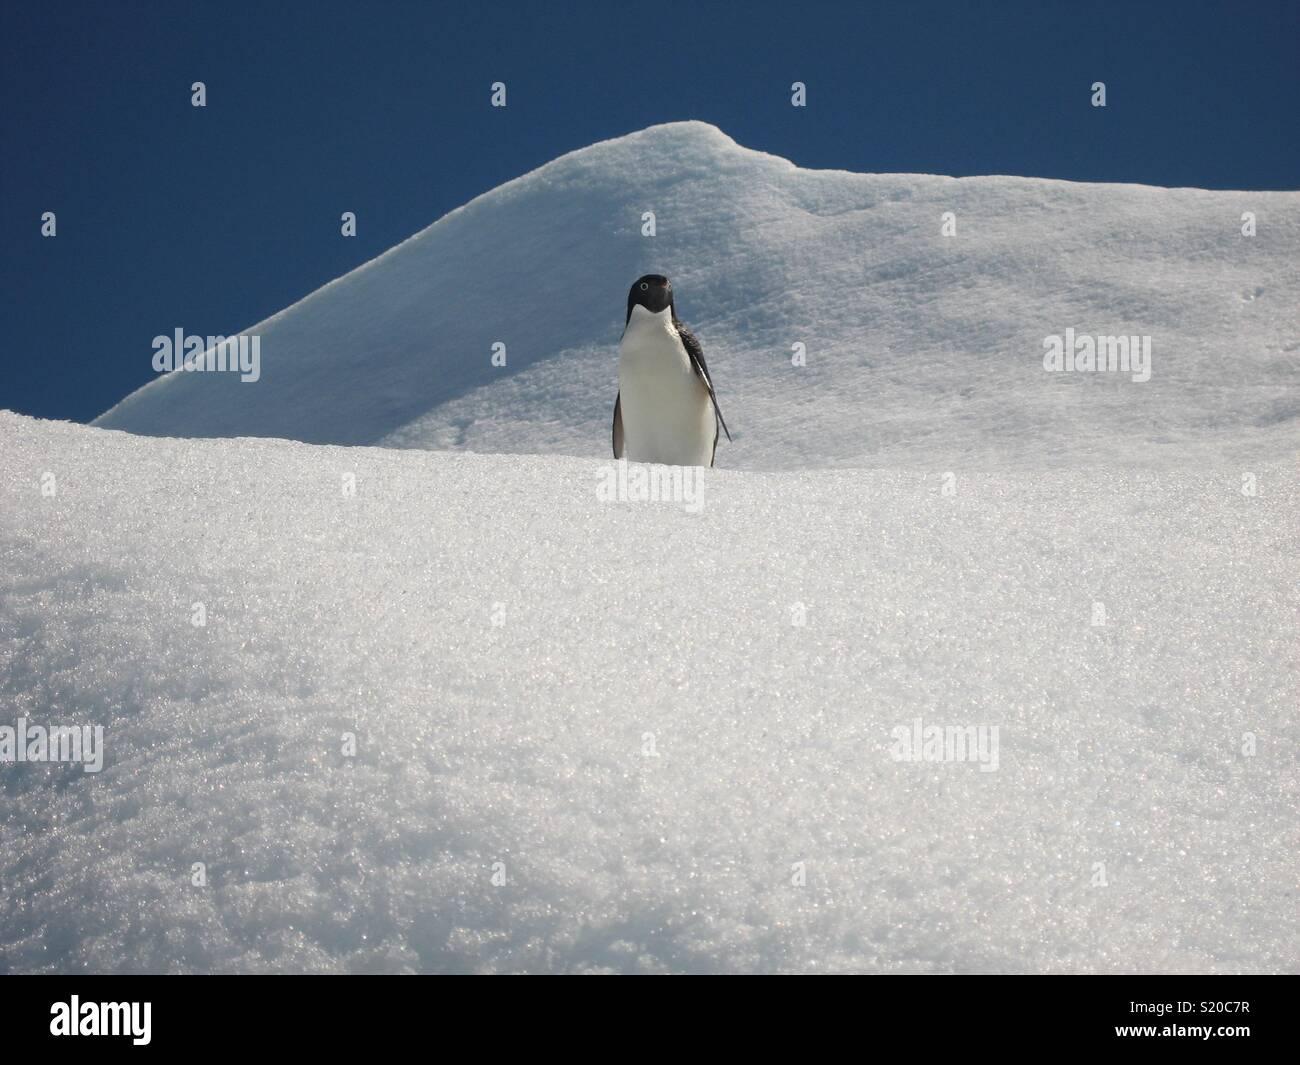 Adelie Penguin, Antarctic Peninsula. - Stock Image